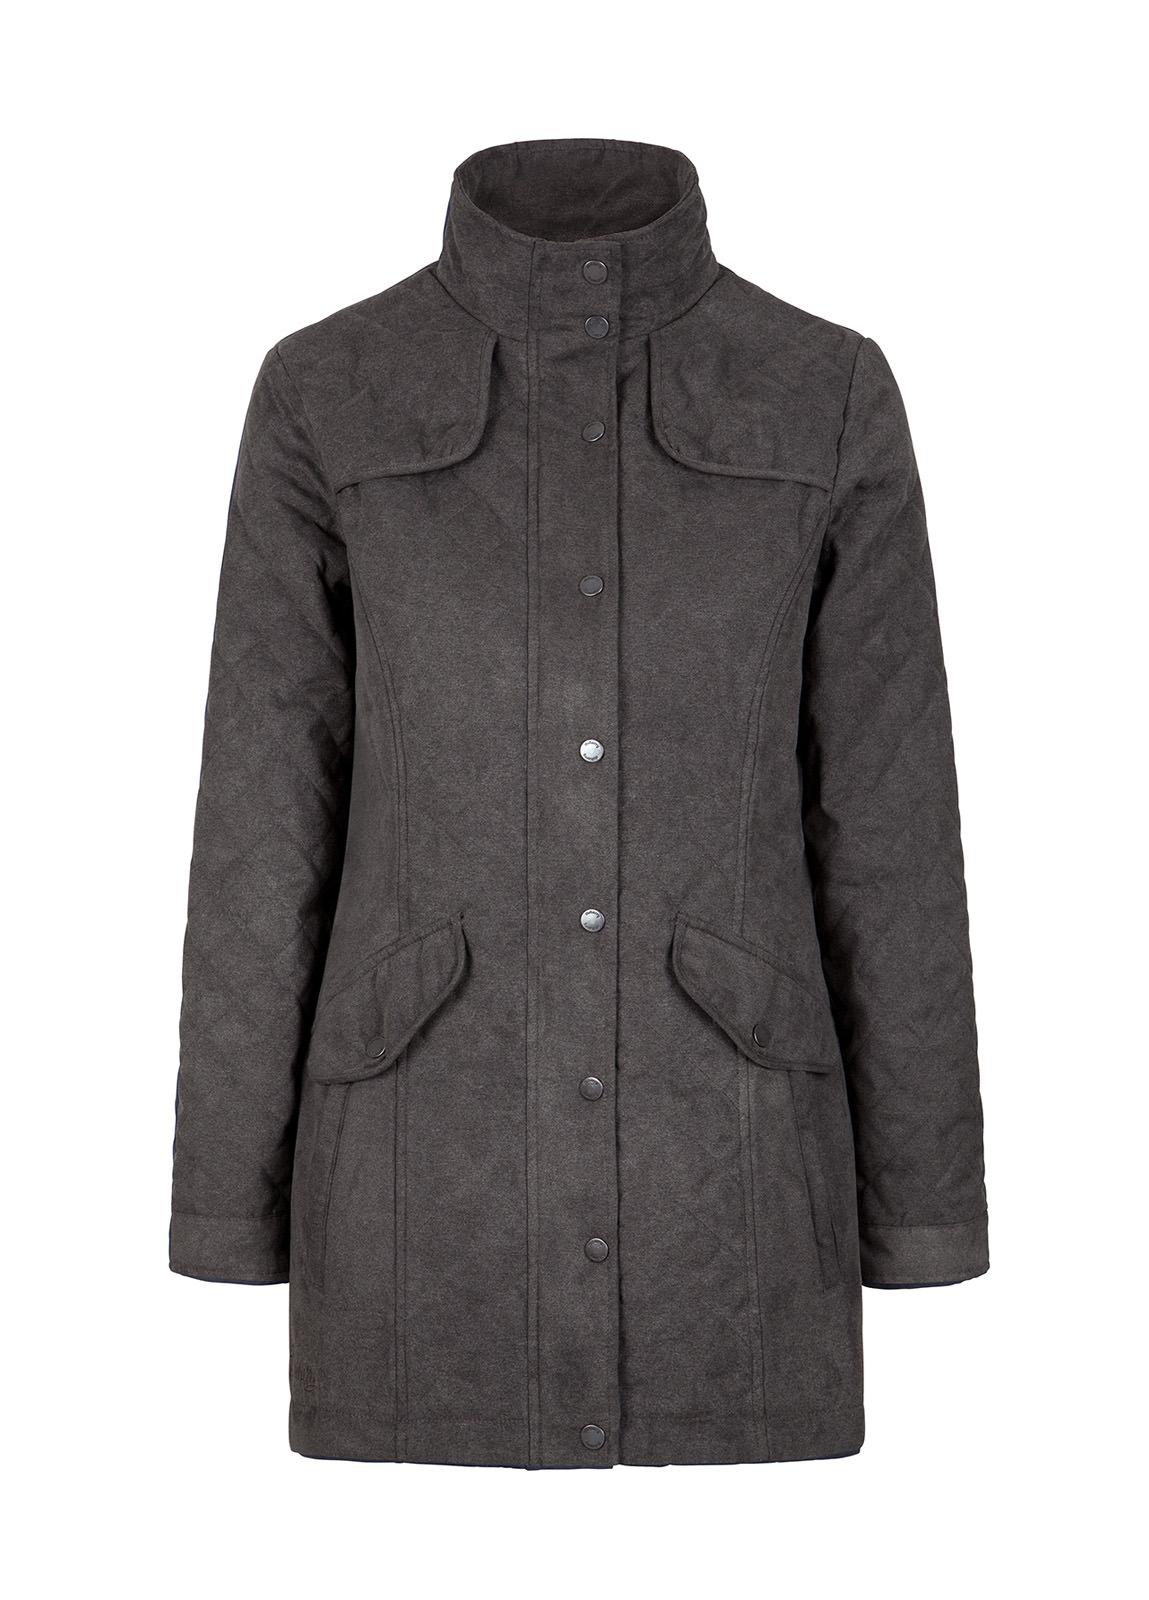 best wholesaler large discount famous brand Kanturk Womens Quilted Coat - Graphite